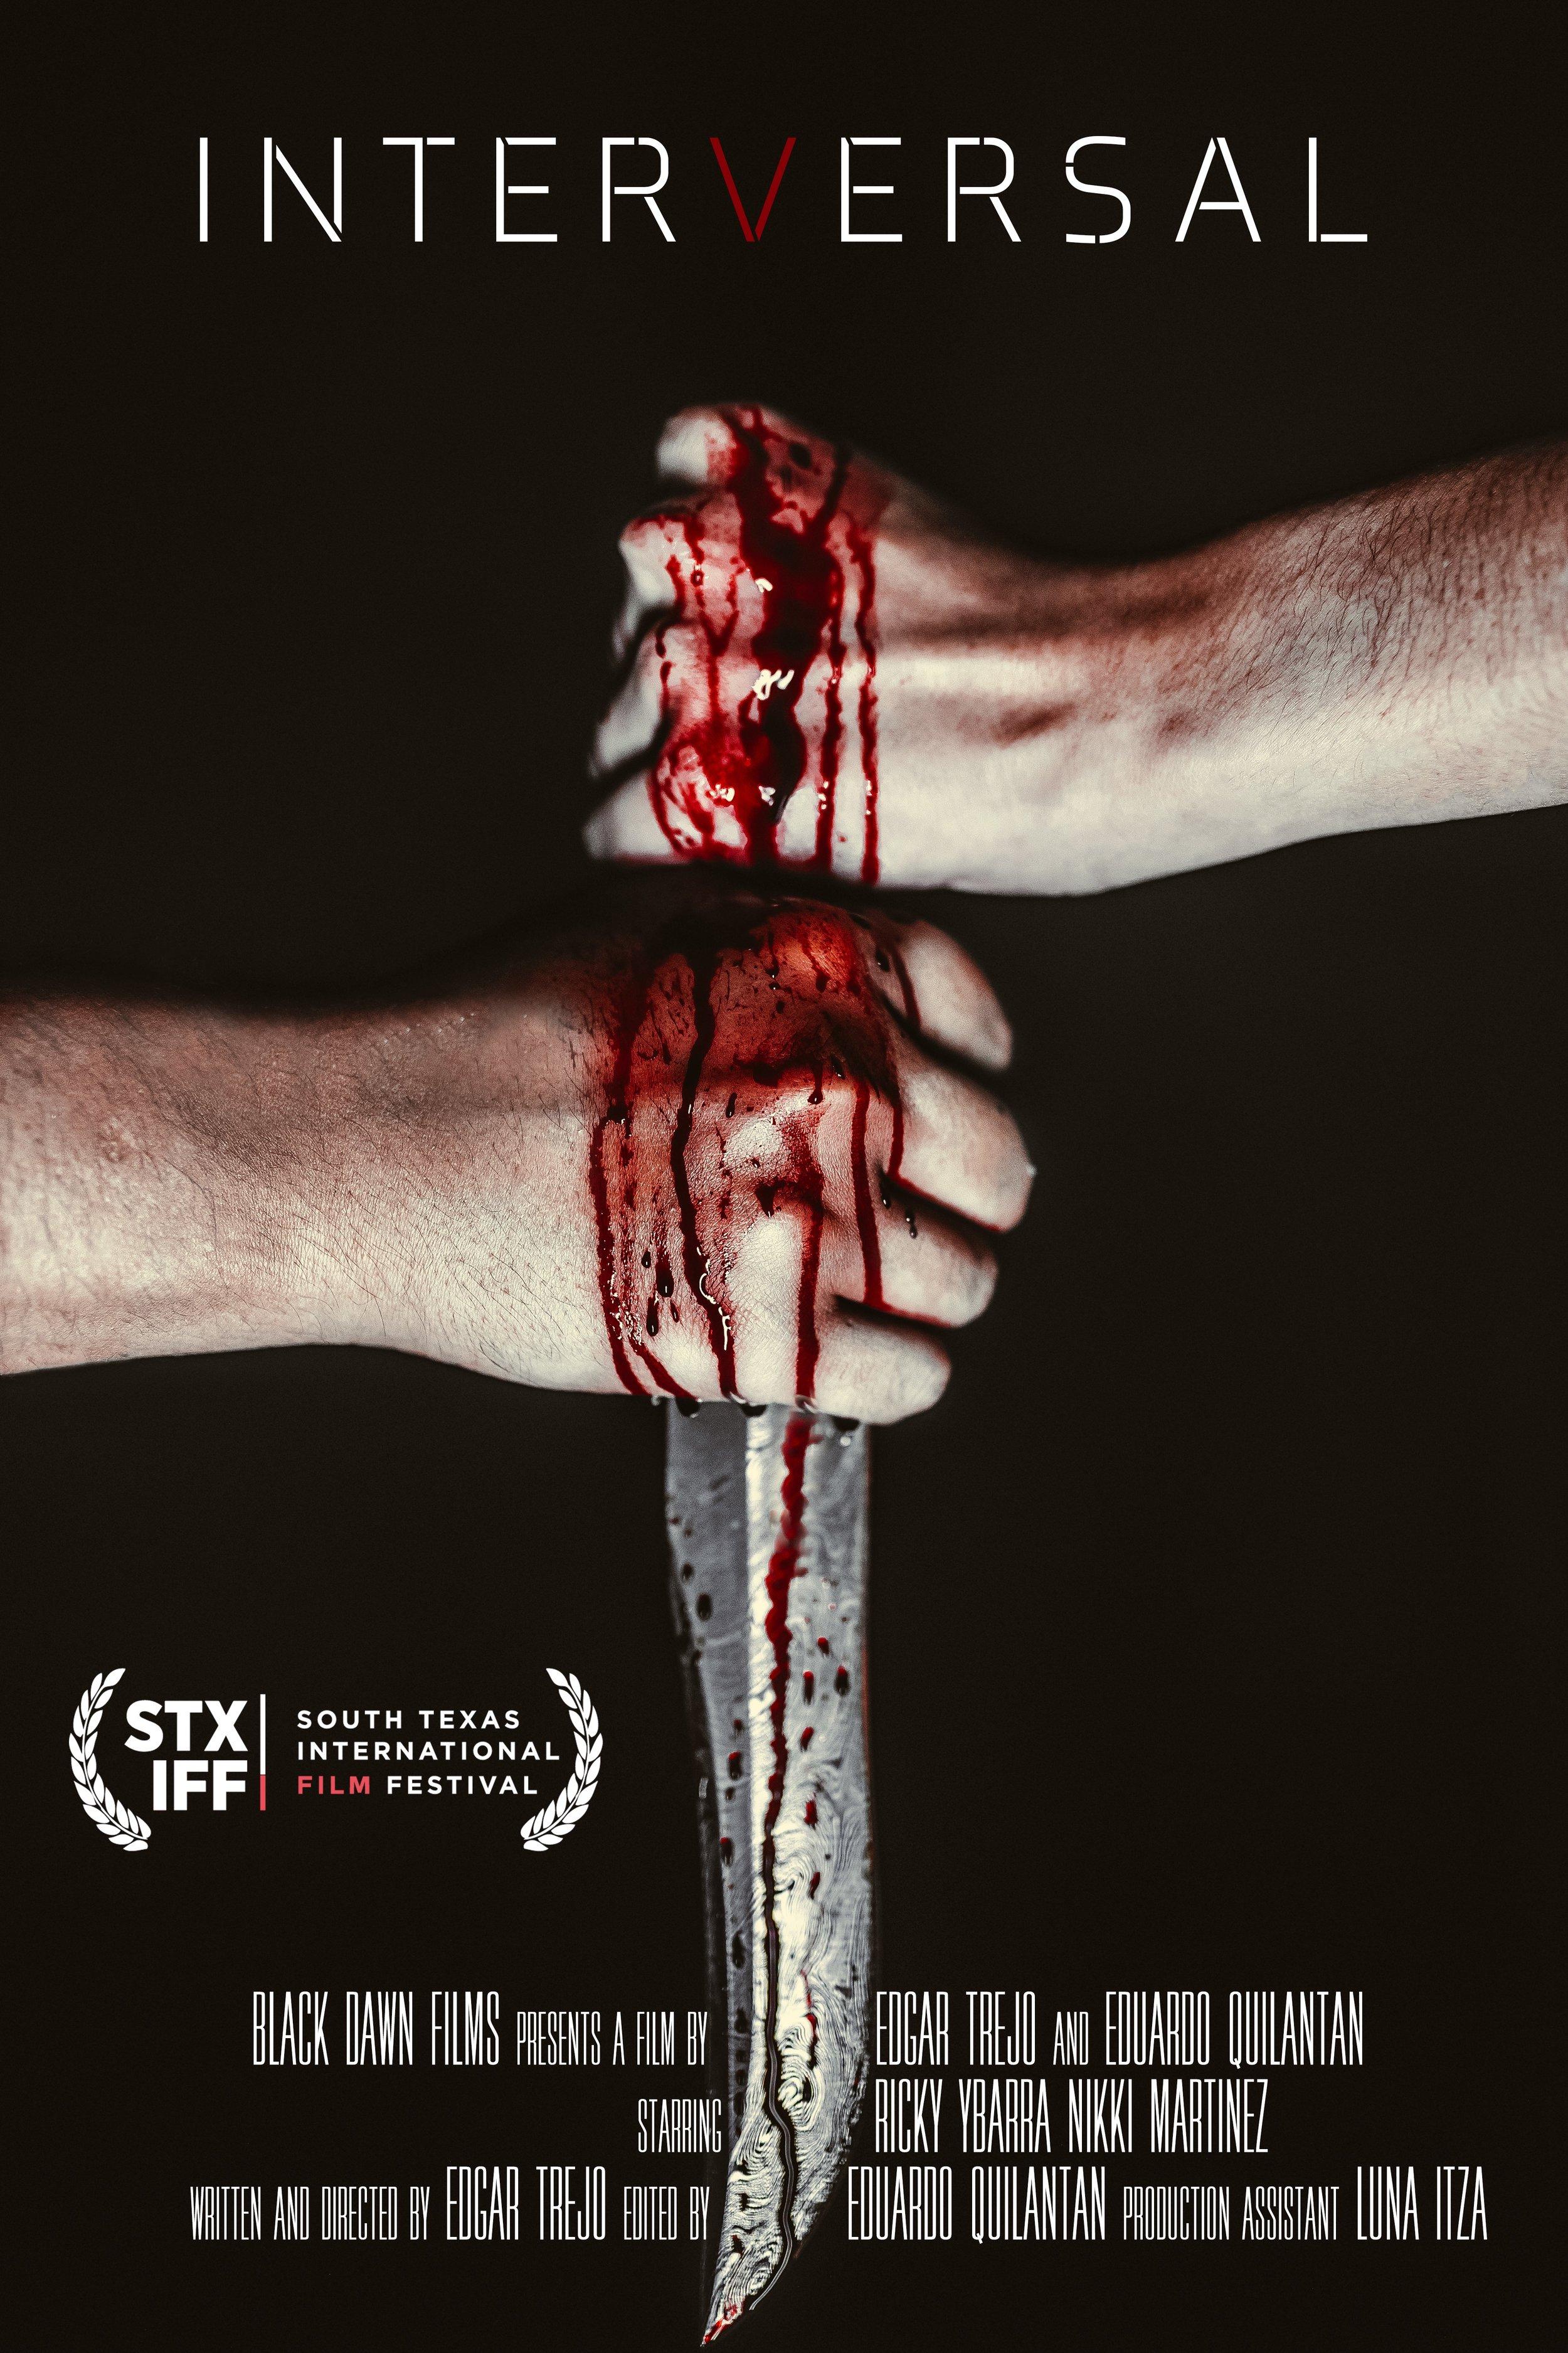 Directed by Eduardo Quilantan -